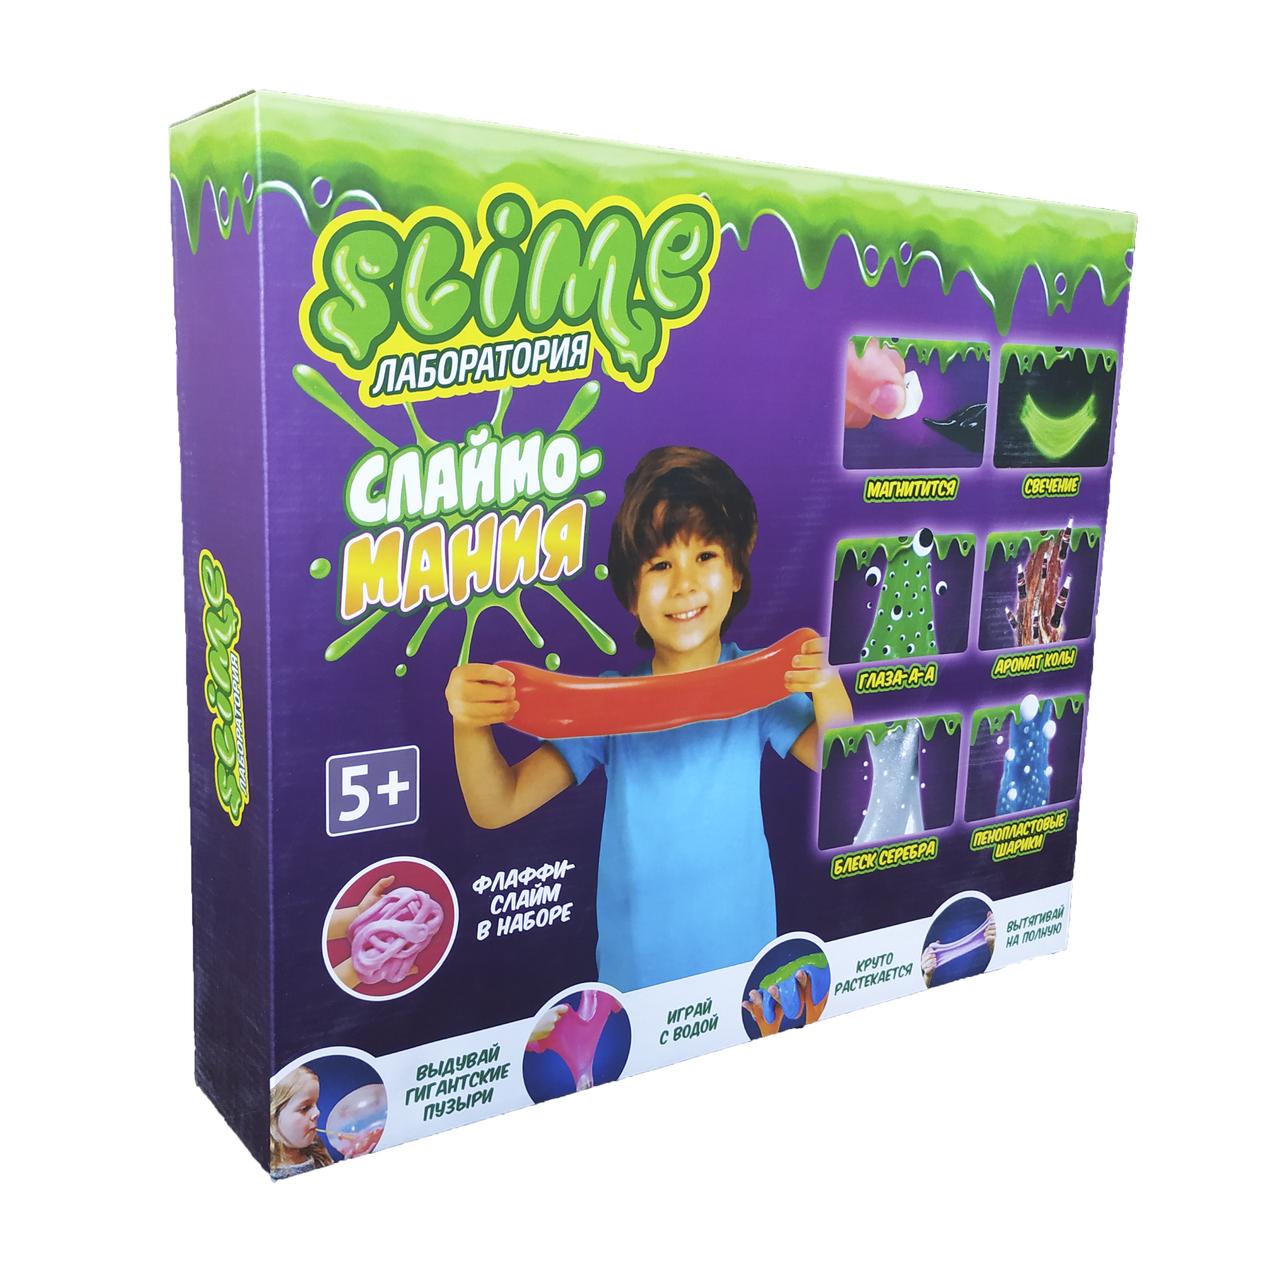 Набор для создания слаймов Slime Лаборатория №2 sct